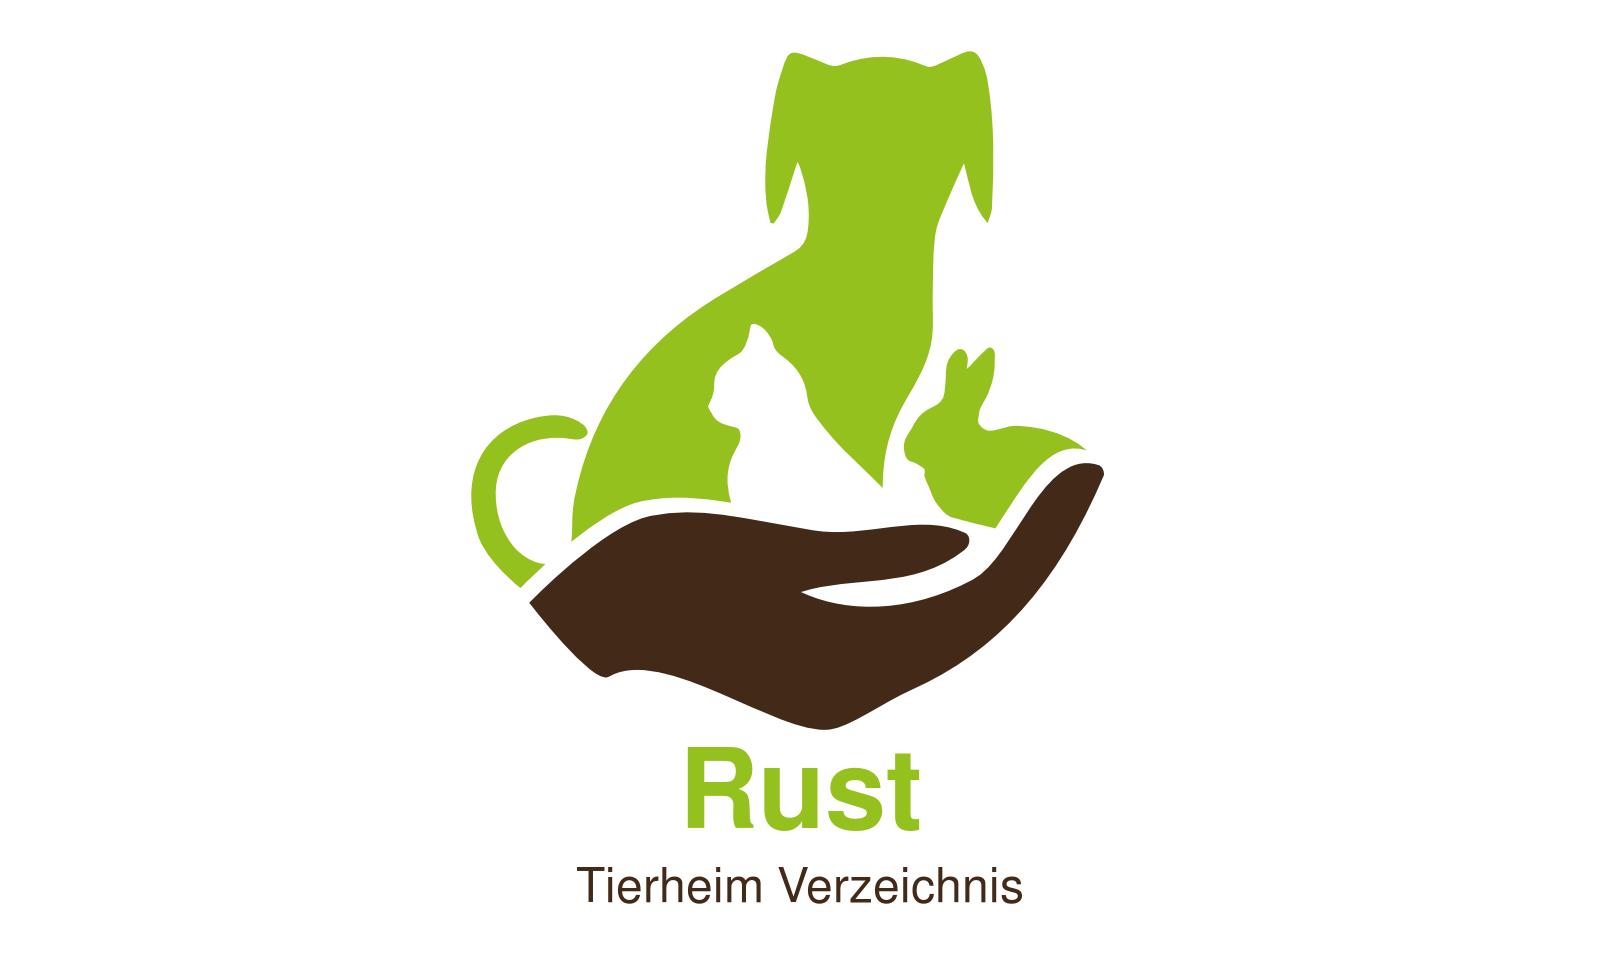 Tierheim Rust